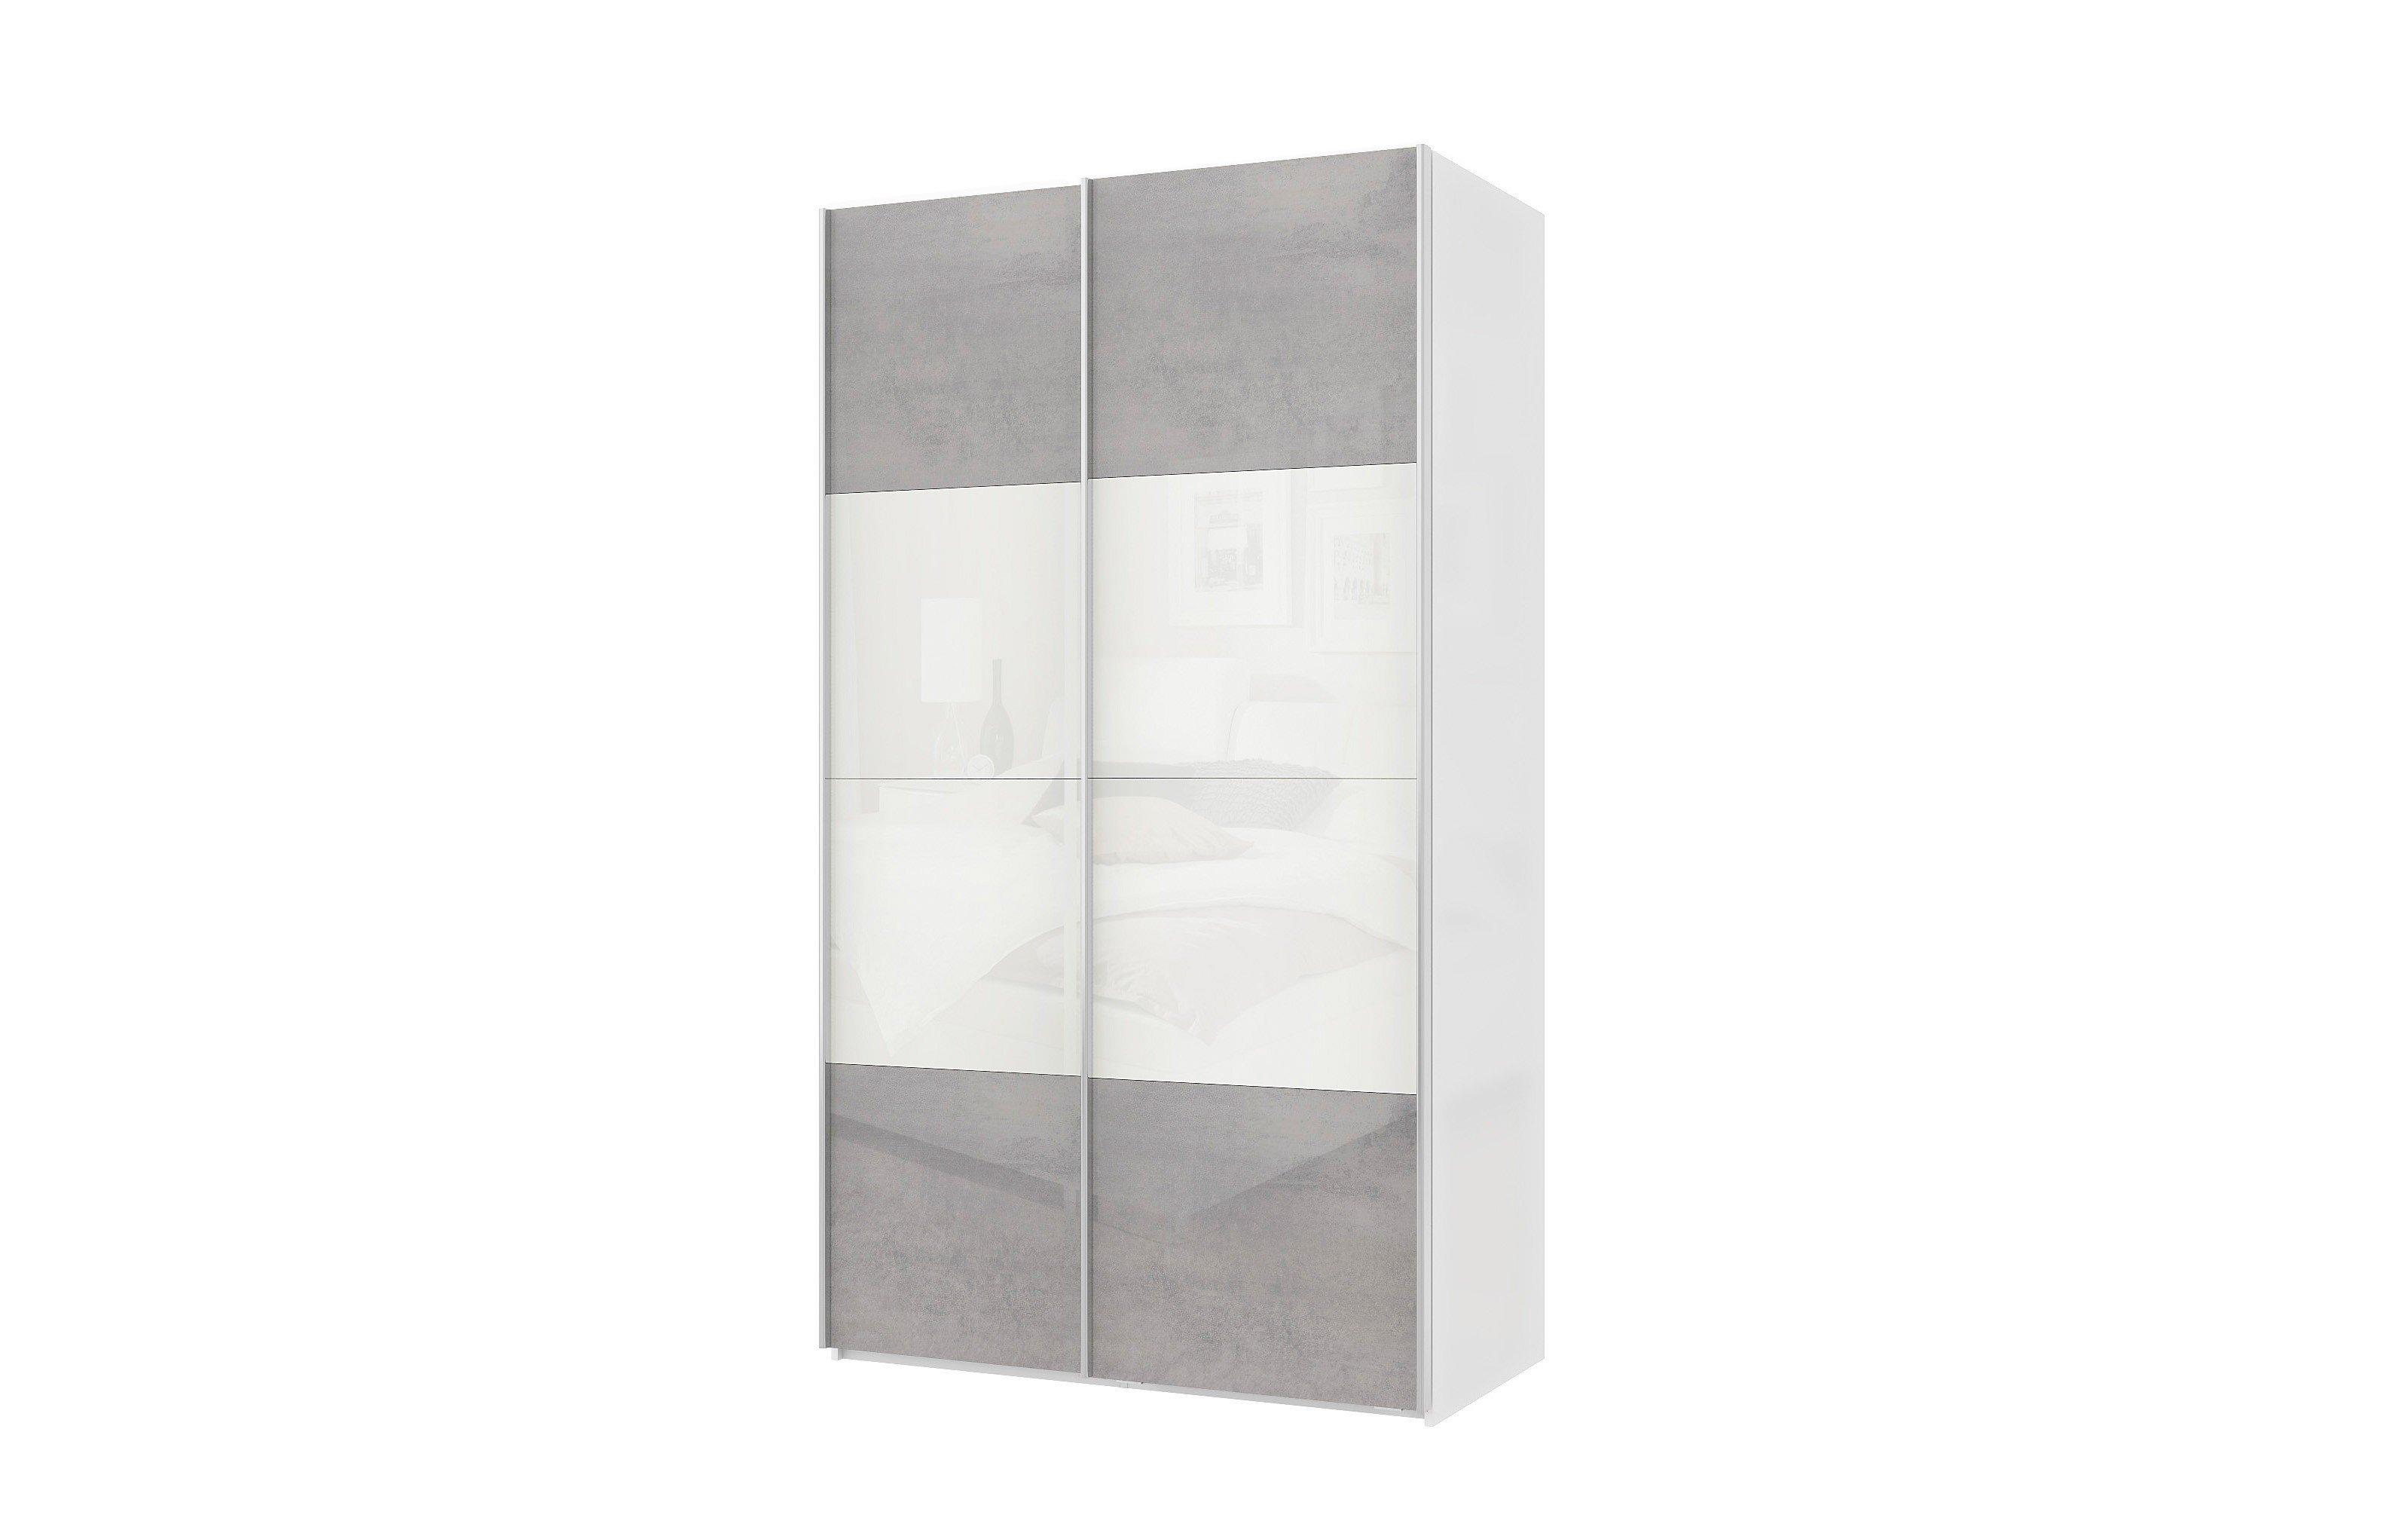 Wellemöbel Varianta 4 Schrank Beton-Optik - alpinweiß | Möbel Letz ...